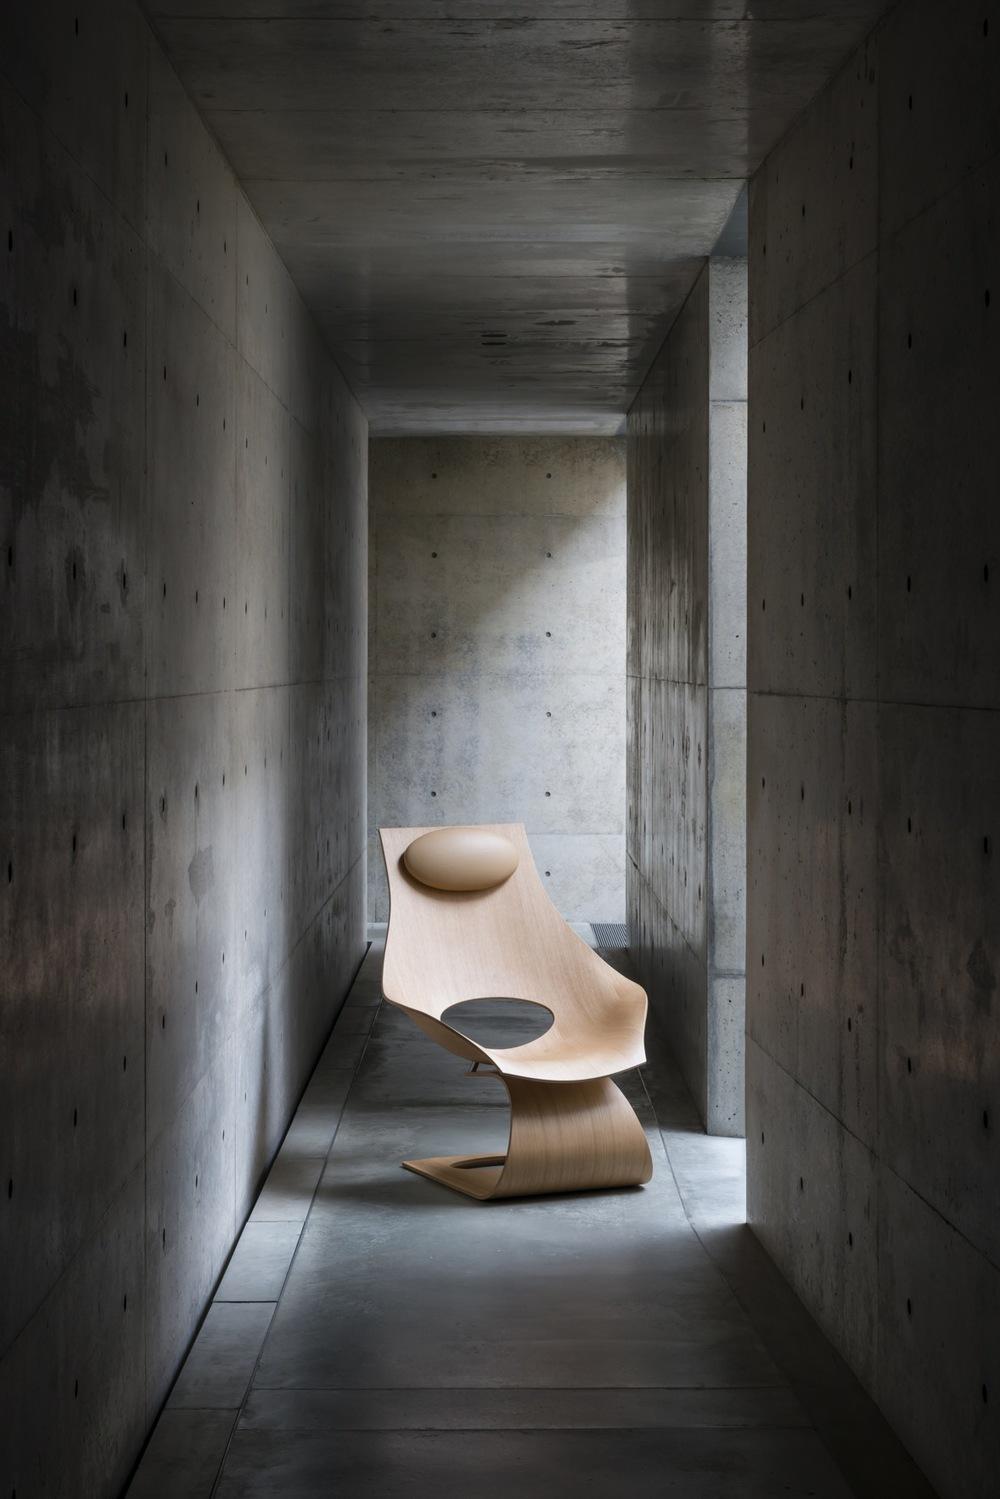 Tadao Ando's Dream Chair